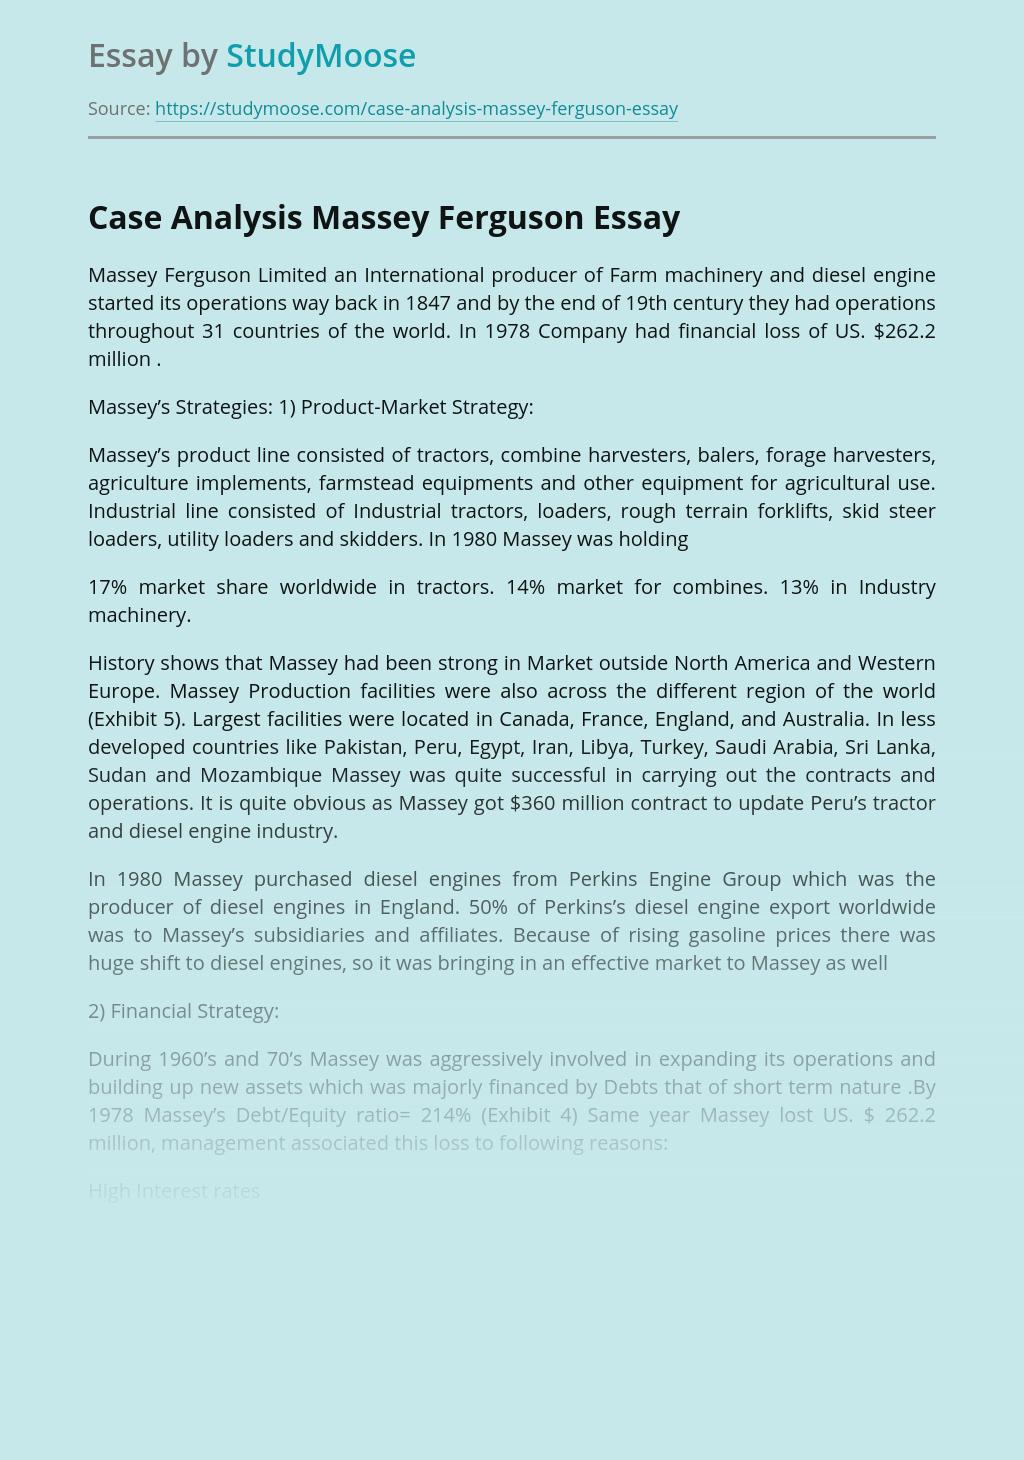 Case Analysis Massey Ferguson